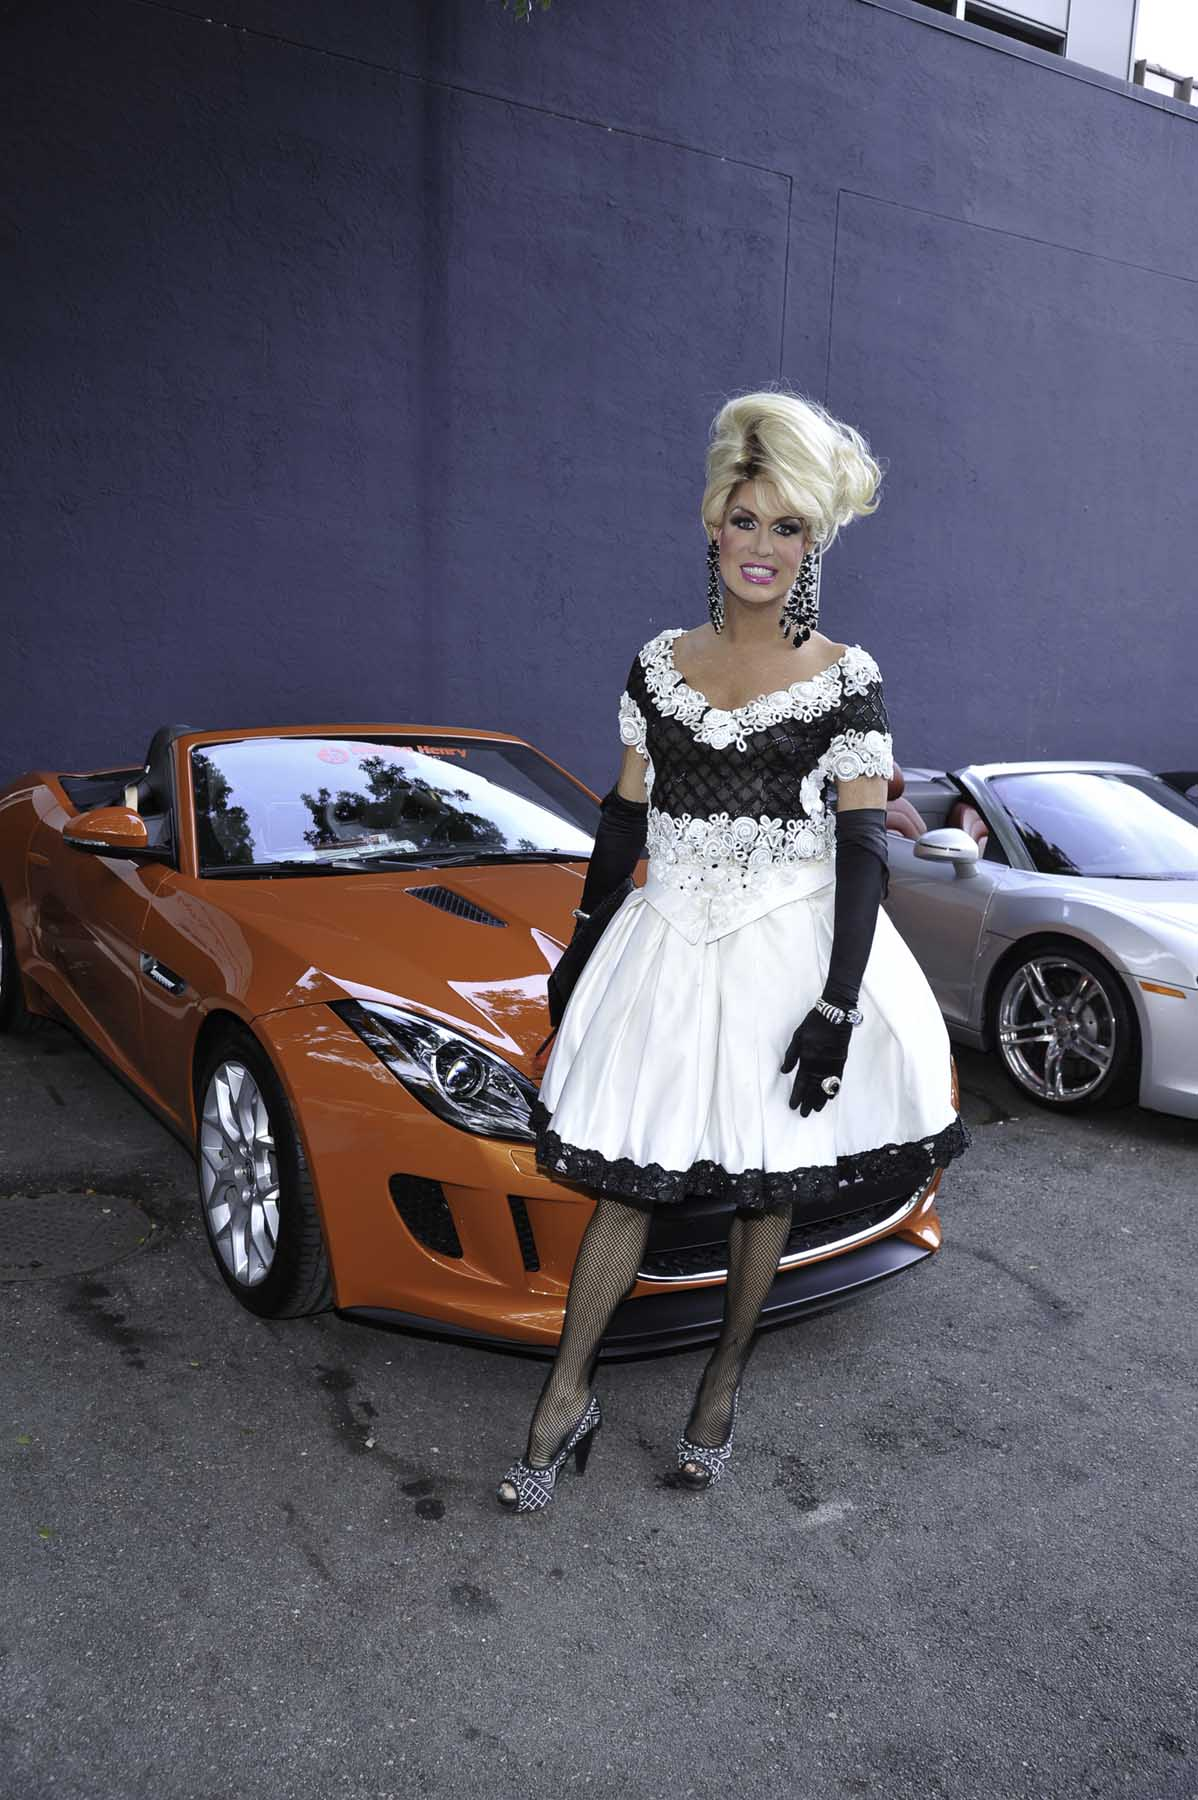 Elaine Lancaster with a 2014 Jaguar F-Type from Warren Henry Jaguar, a division of Warren Henry Auto Group